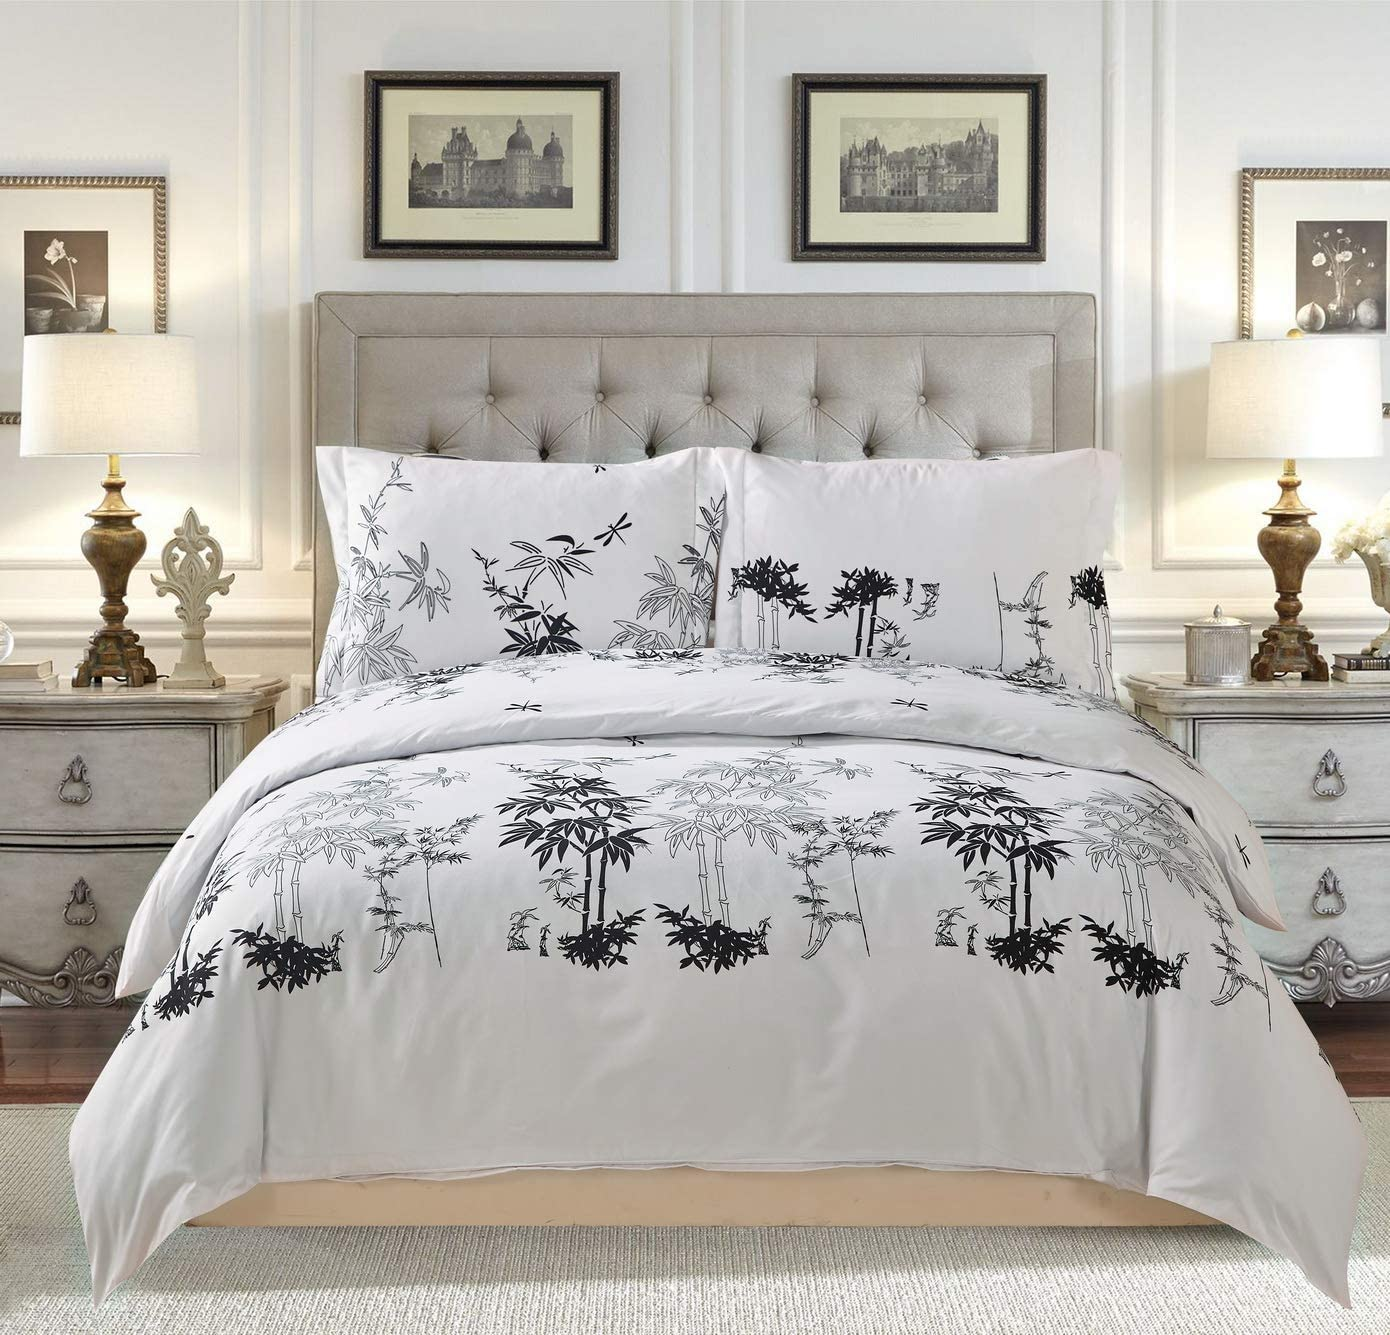 Duvet Cover Sets Comforter 3 Ranking TOP5 Soft Max 71% OFF Brushed Microfiber